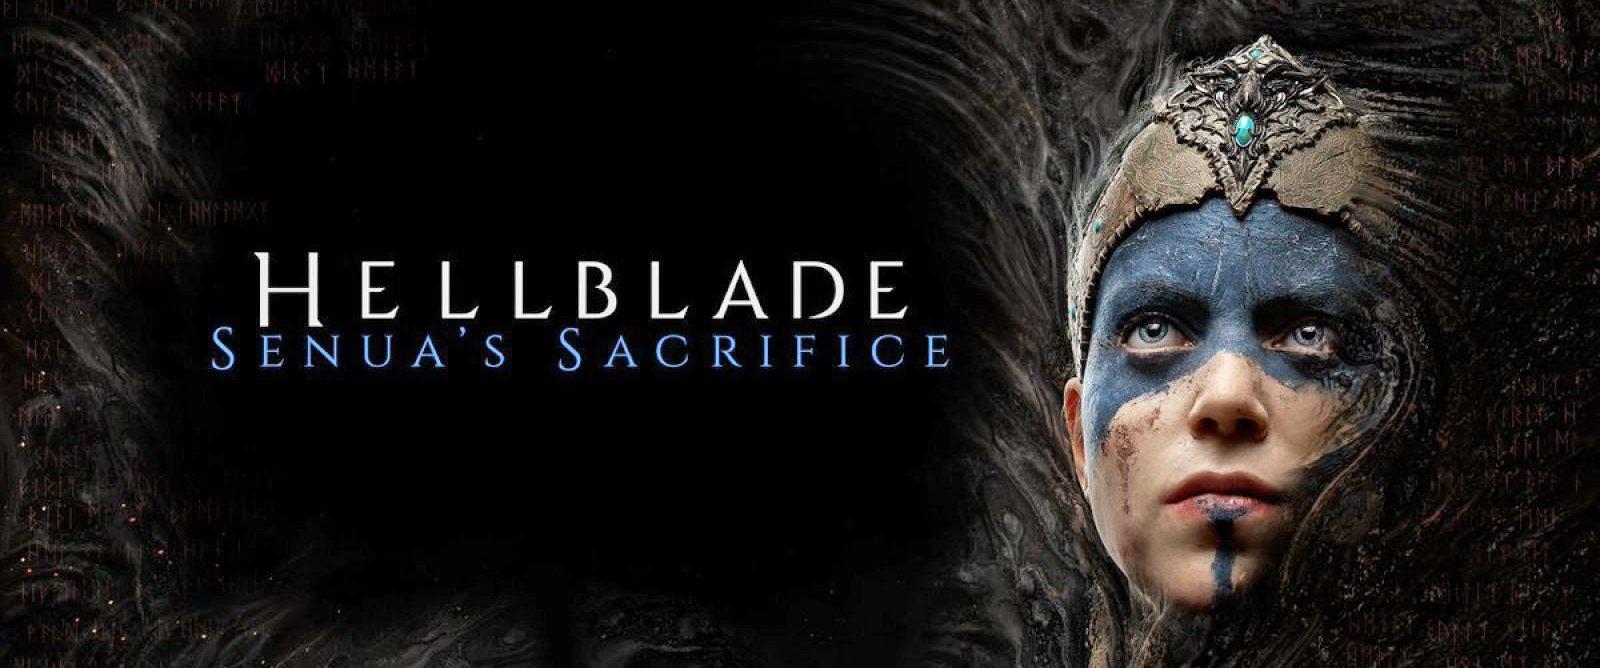 dims e1554372049754 - أفضل ألعاب الرعب النفسي على Hellblade: Senua's Sacrifice - PS4